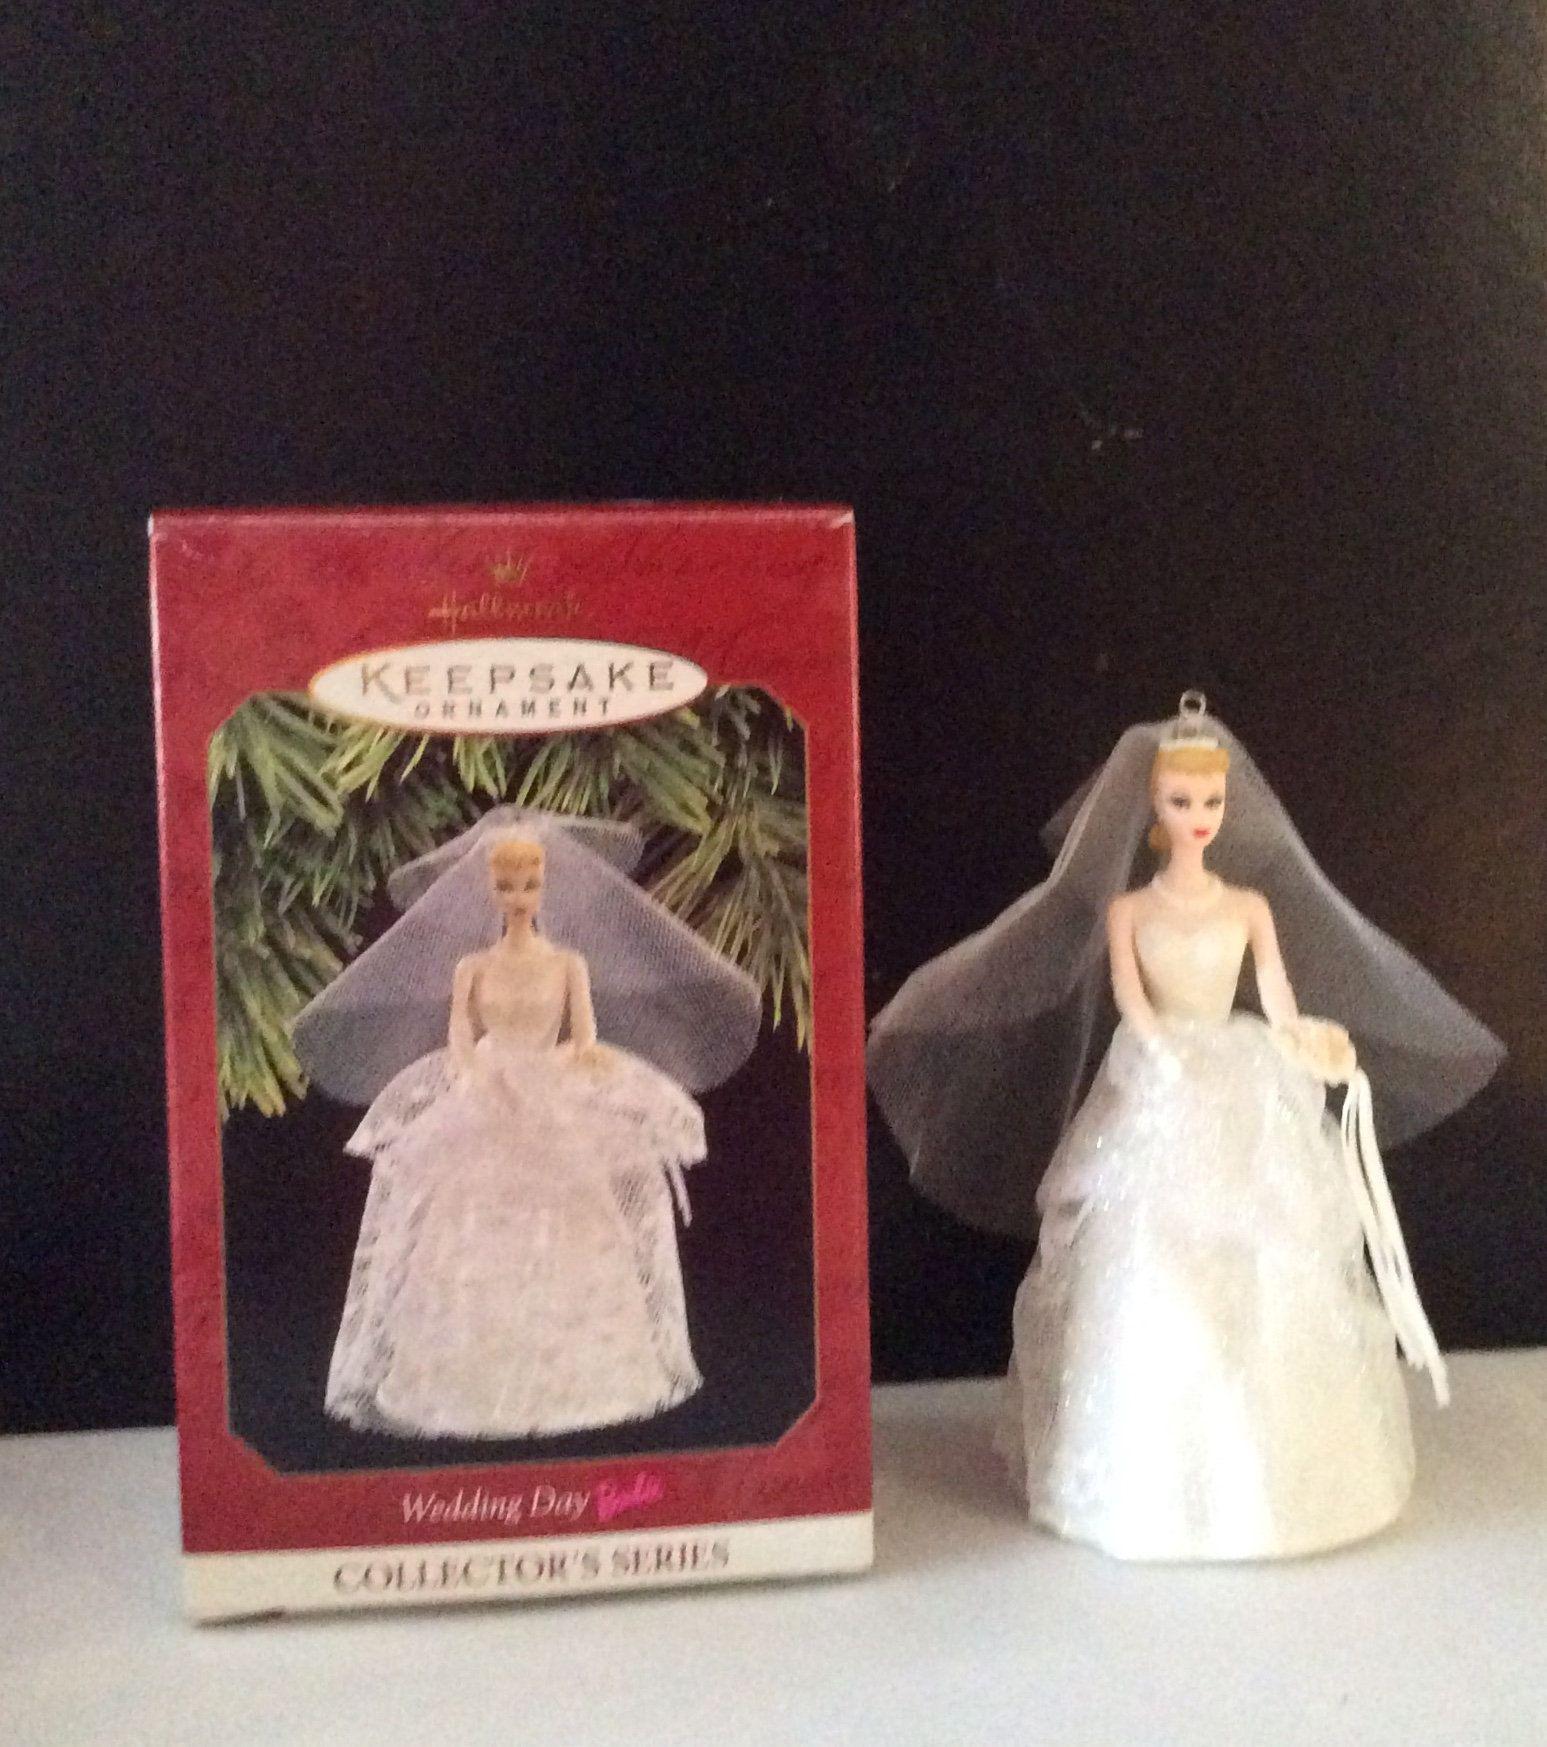 Hallmark Wedding Day Barbie Ornament By Contemporaryvintage On Etsy Hallmark Christmas Ornaments Hallmark Ornaments Wedding Day